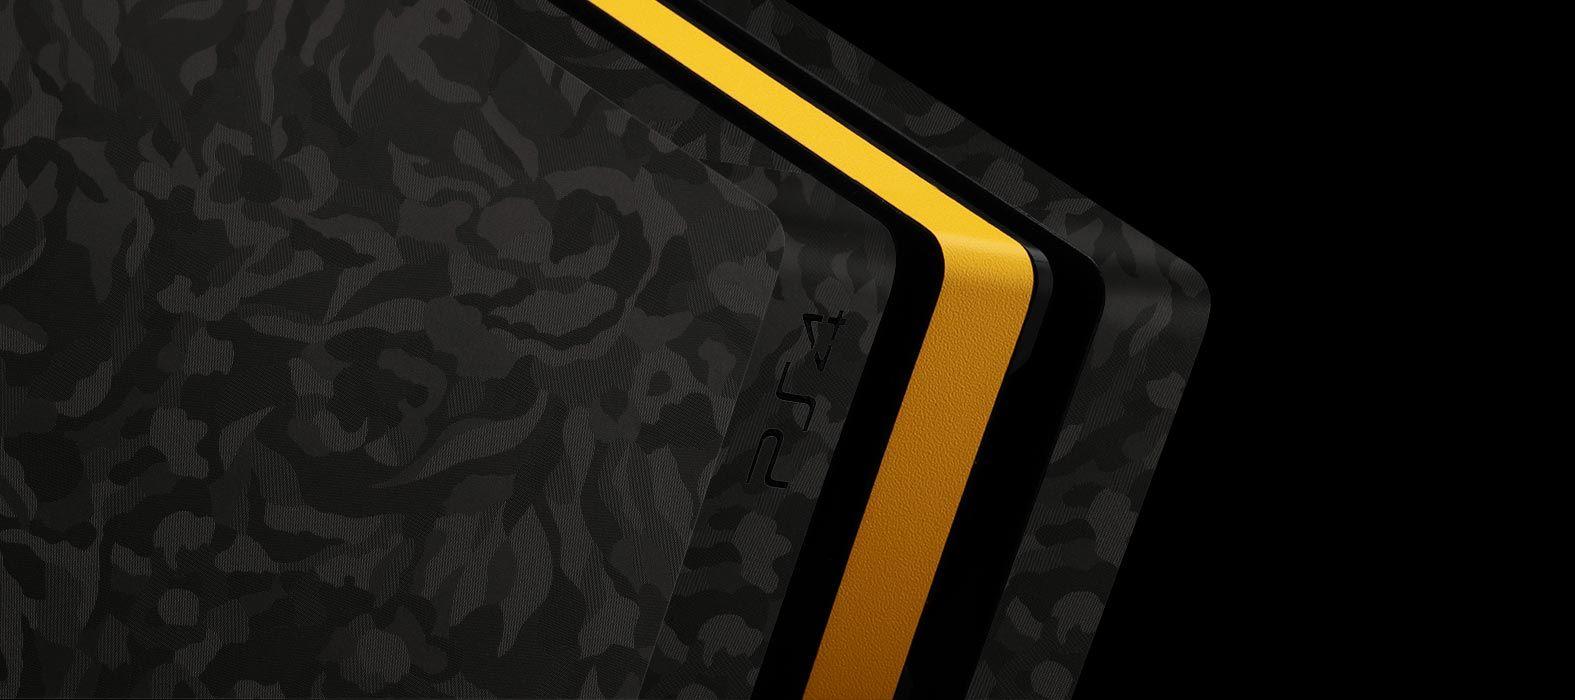 PlaPS 4 Pro Black Camo Skins